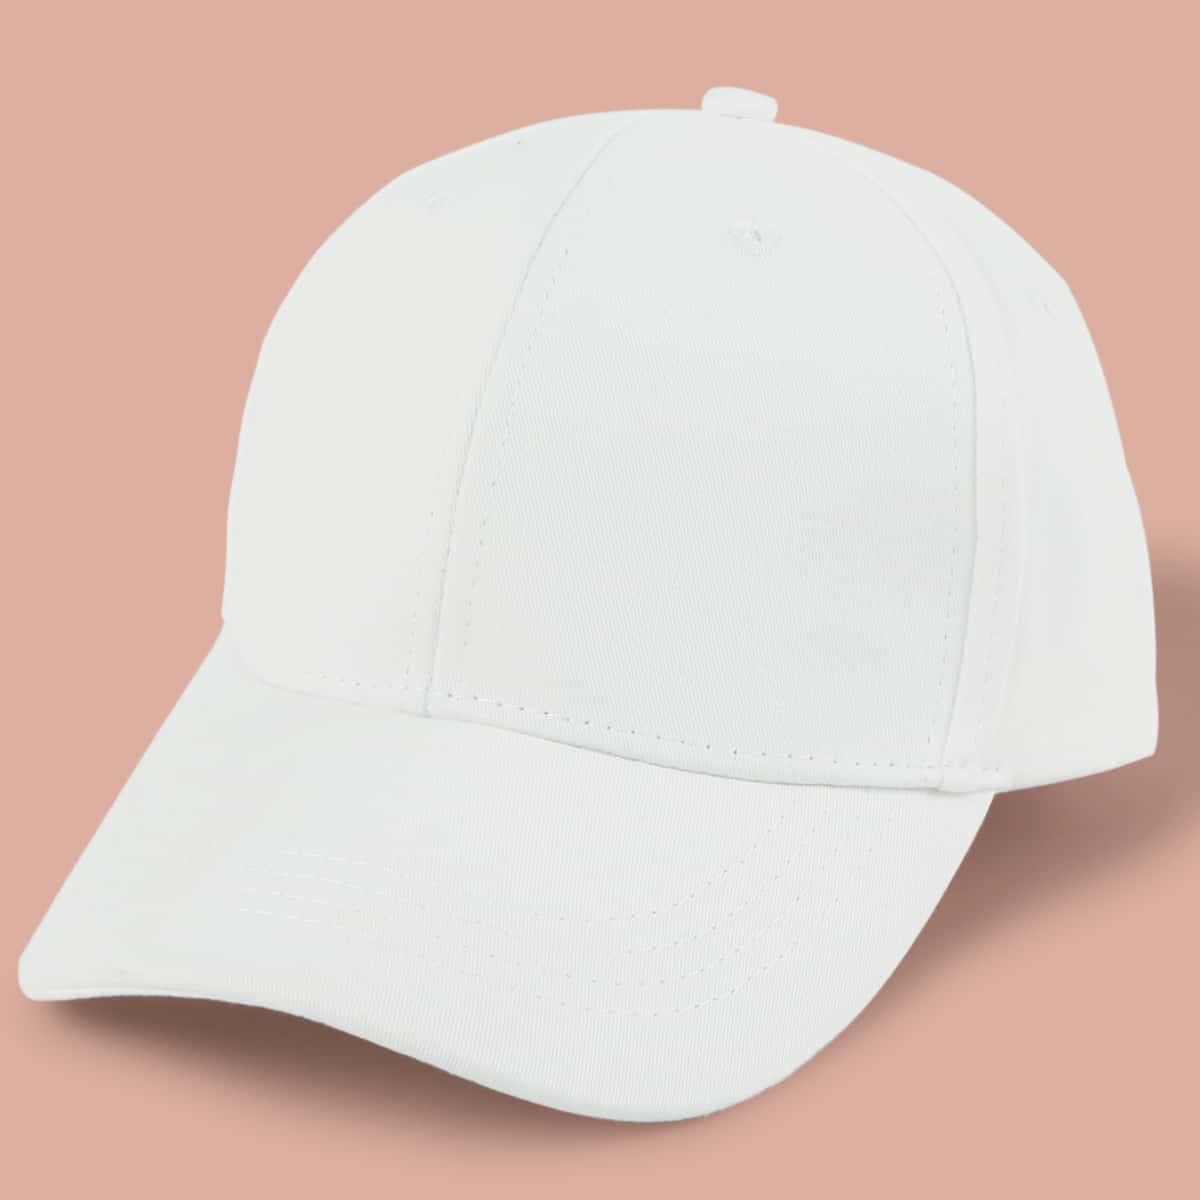 Männer einfarbiger Baseball Hut